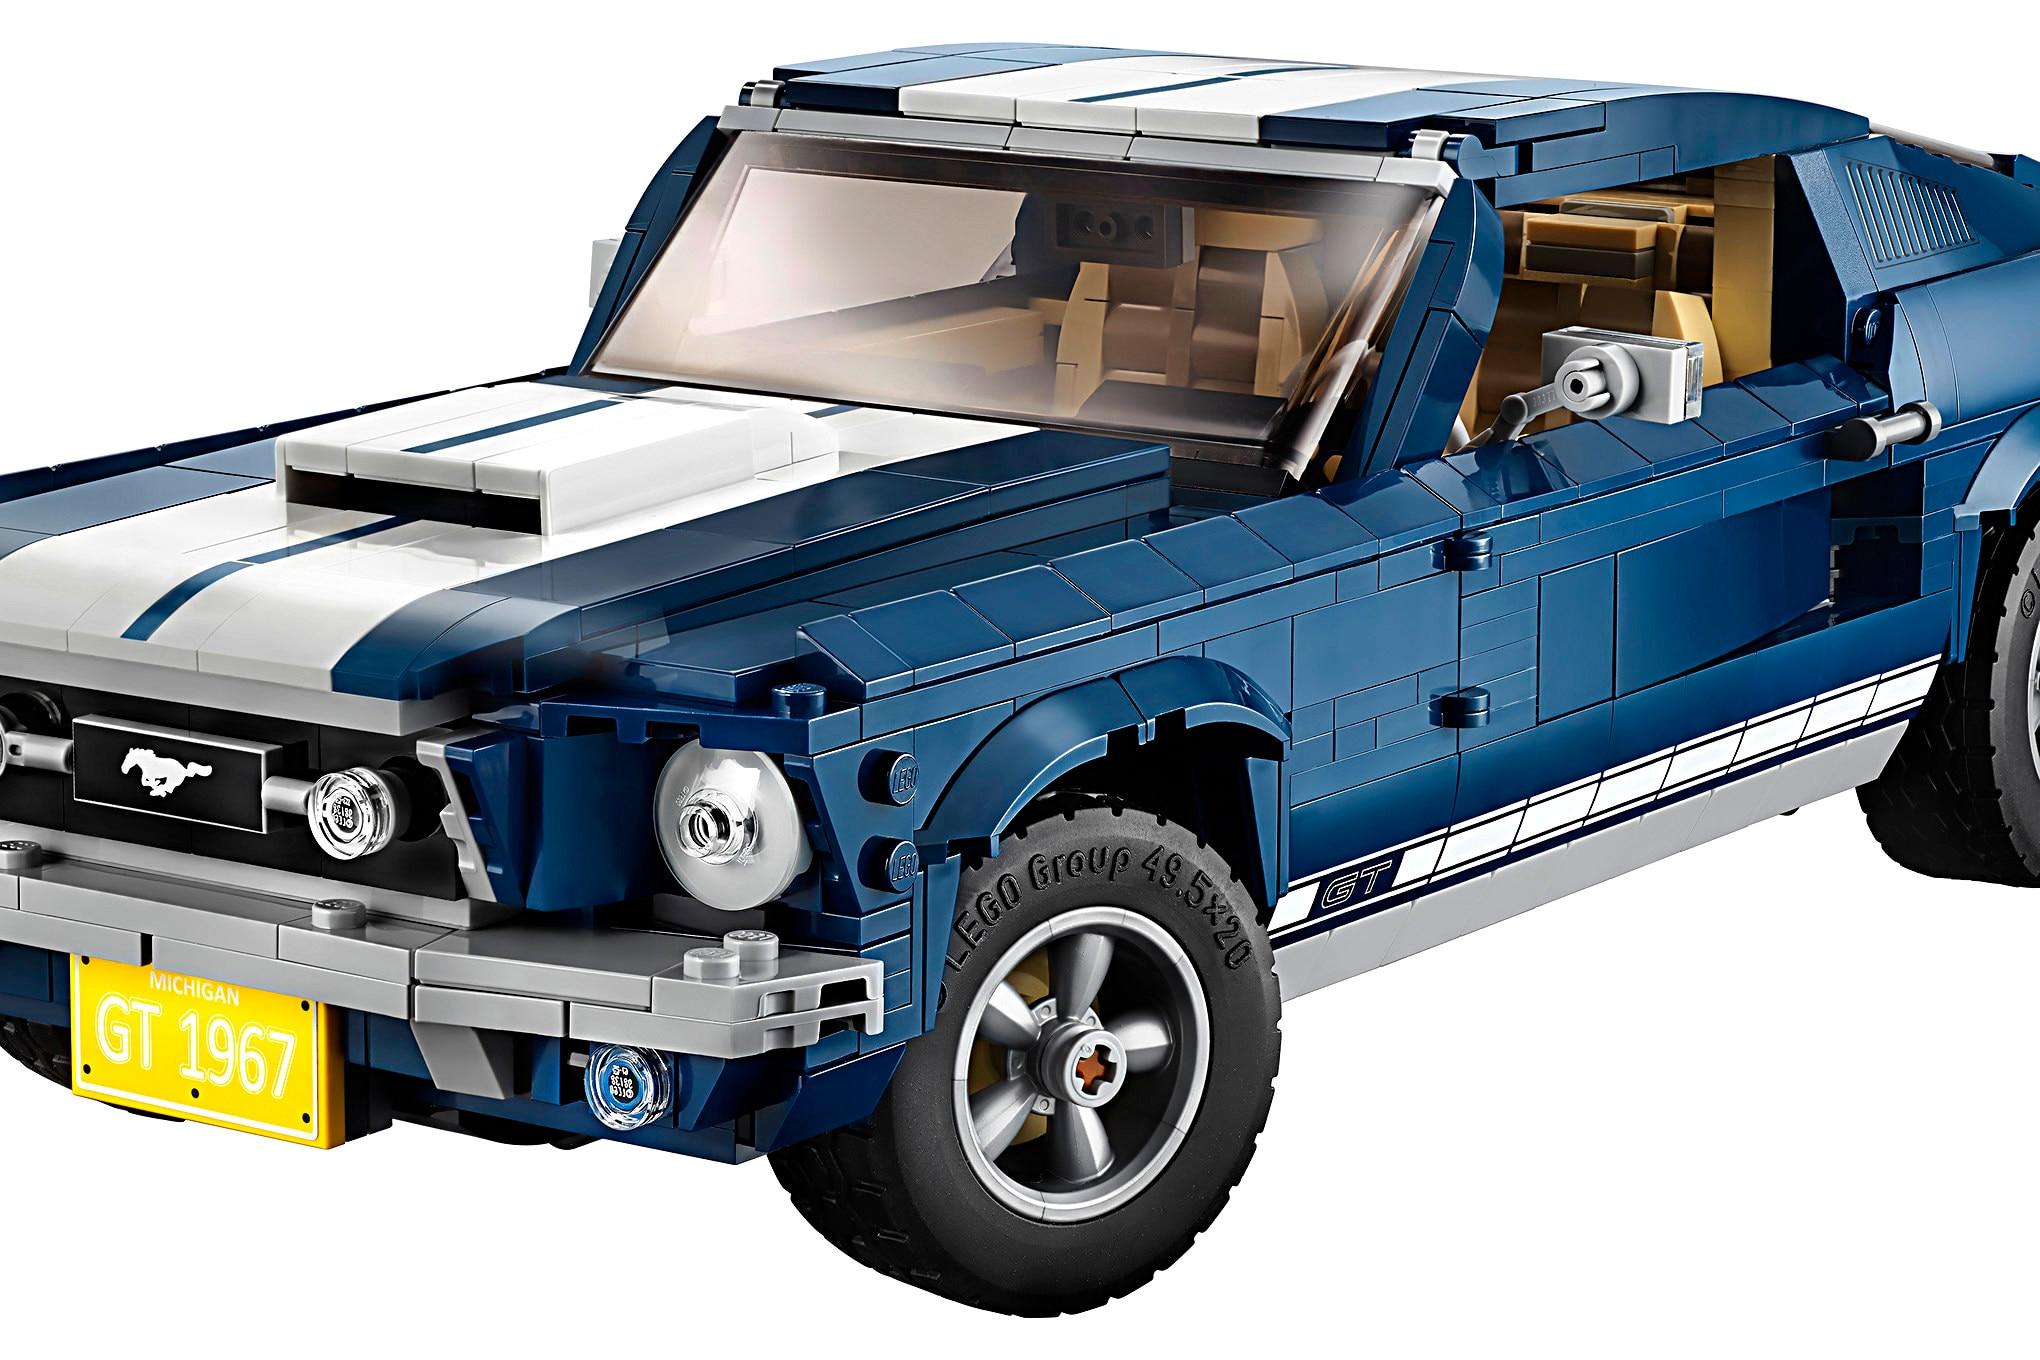 002 LEGO Creator 1967 Mustang Kit